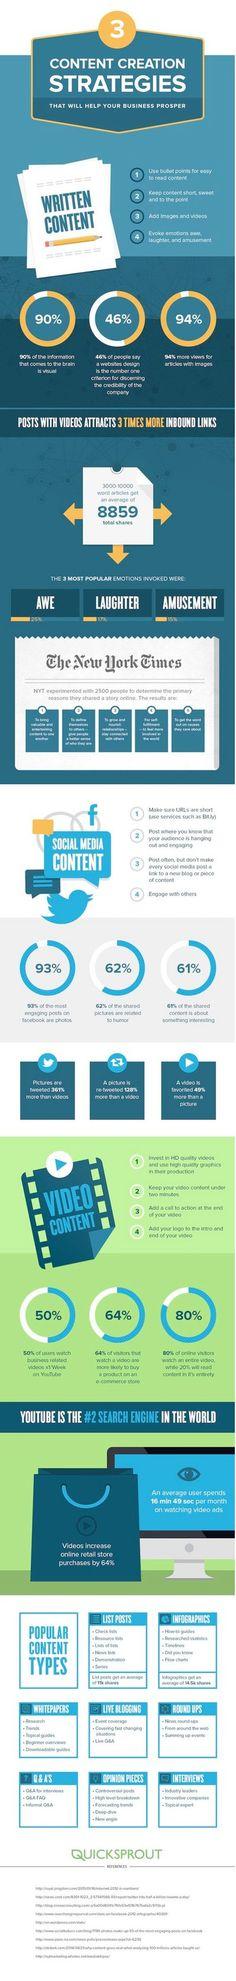 Infographie Content Marketing strategie